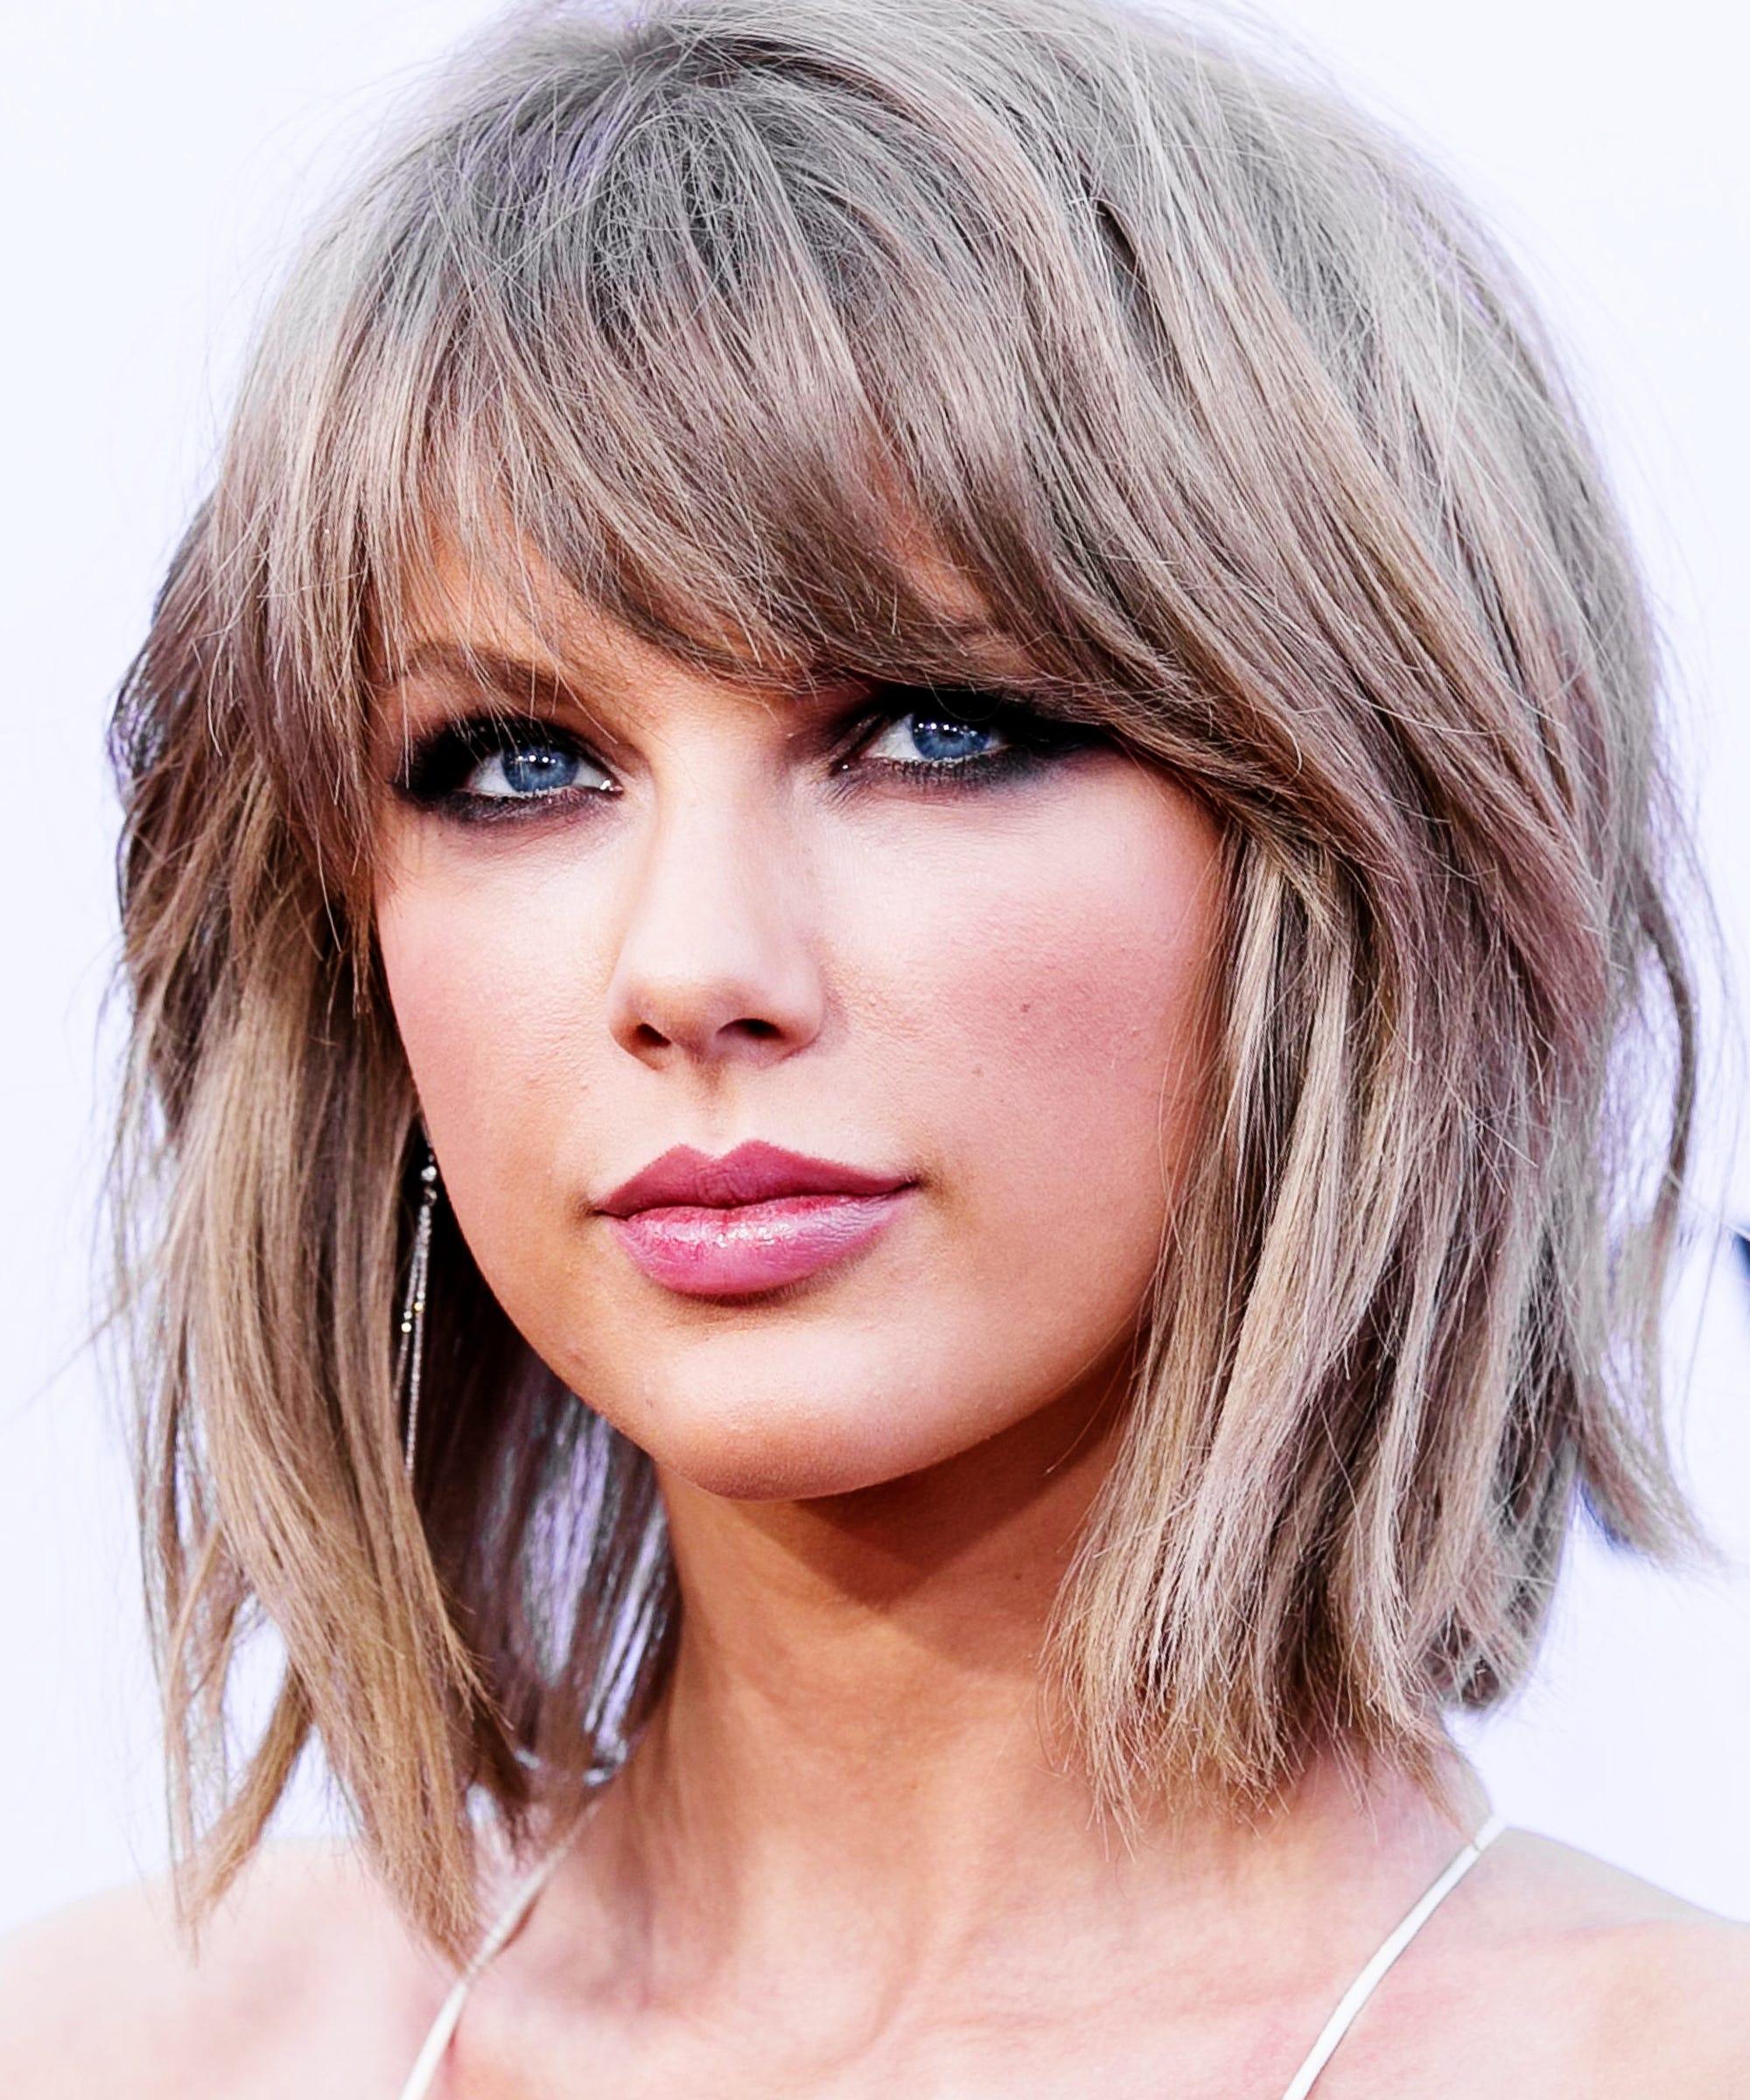 Taylor Swift Hair Cut Grammys 2016